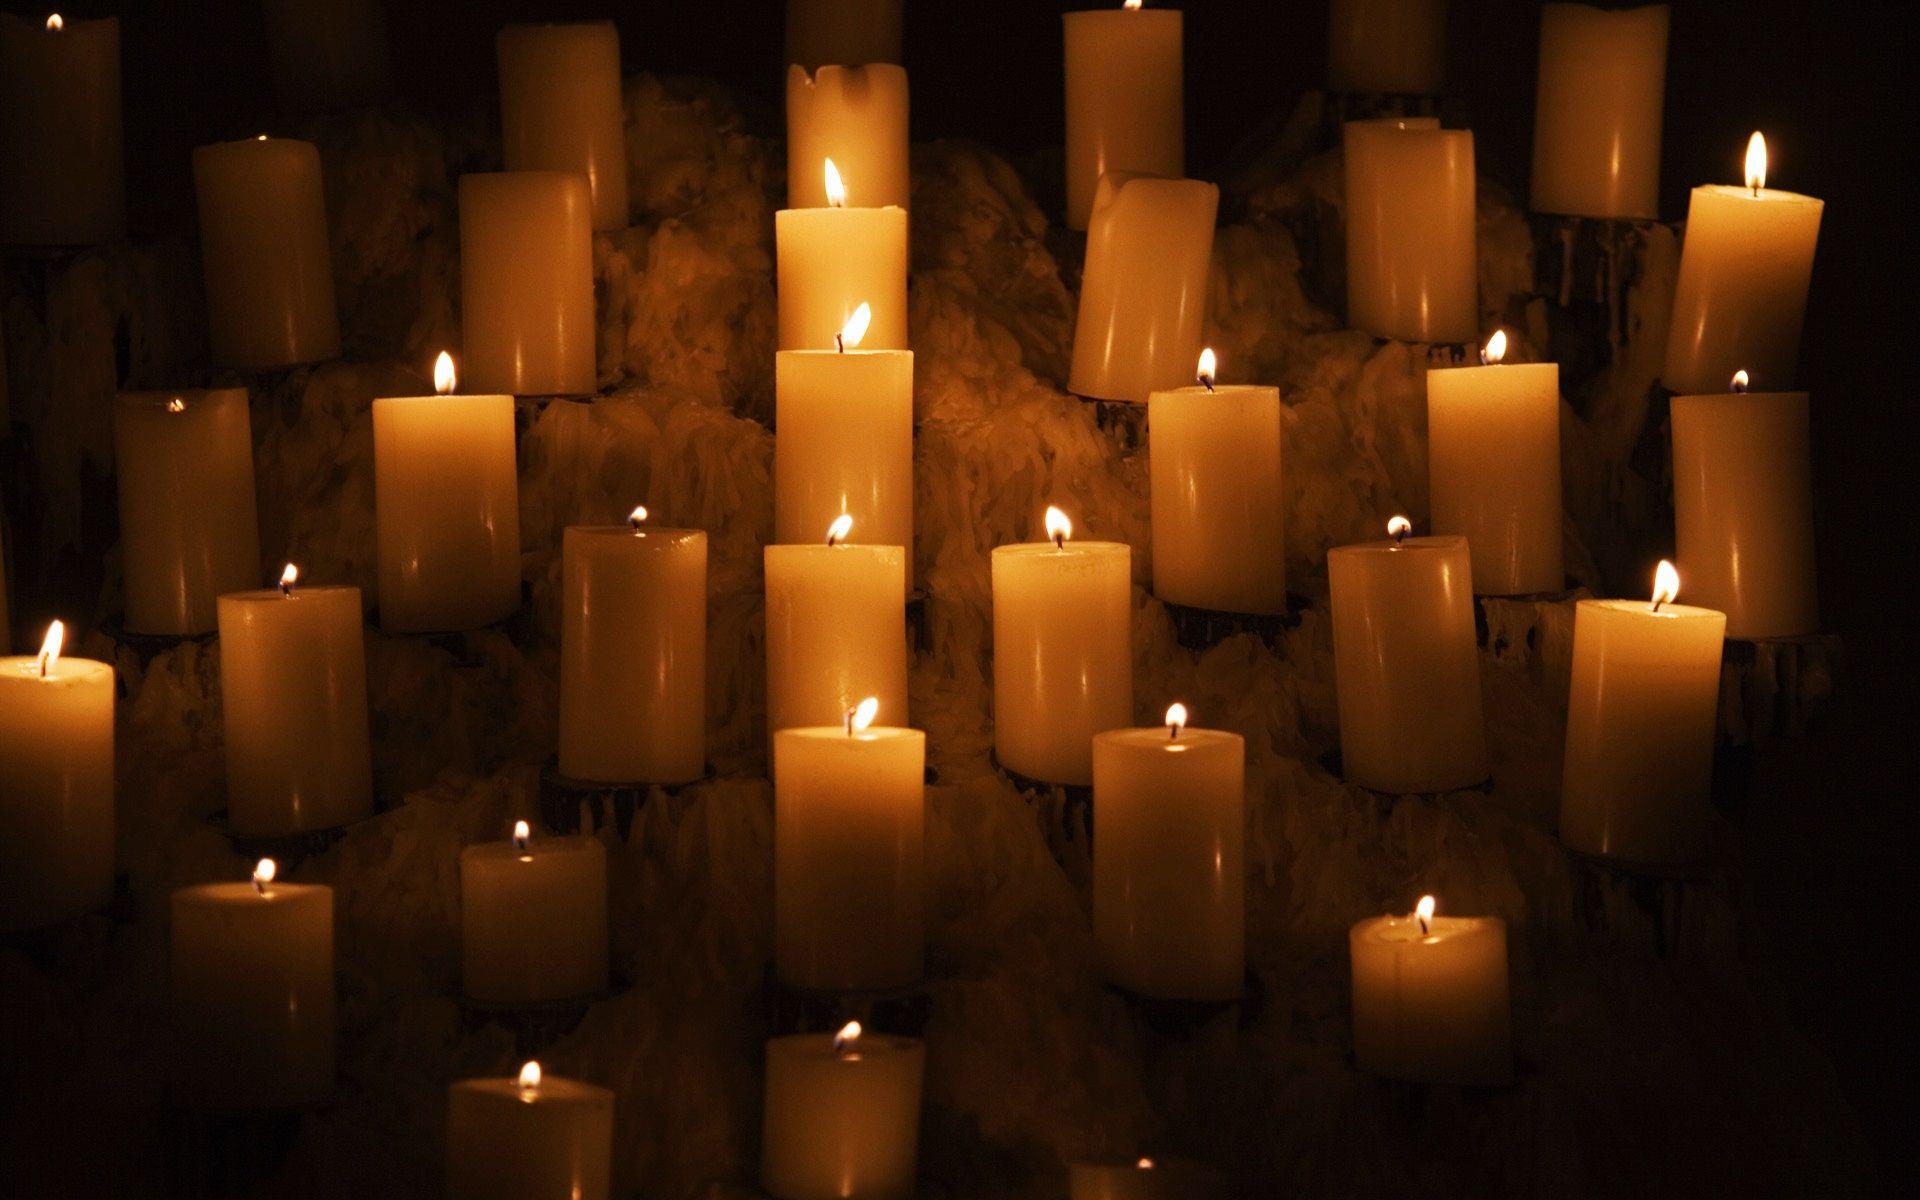 candlelight wallpaper